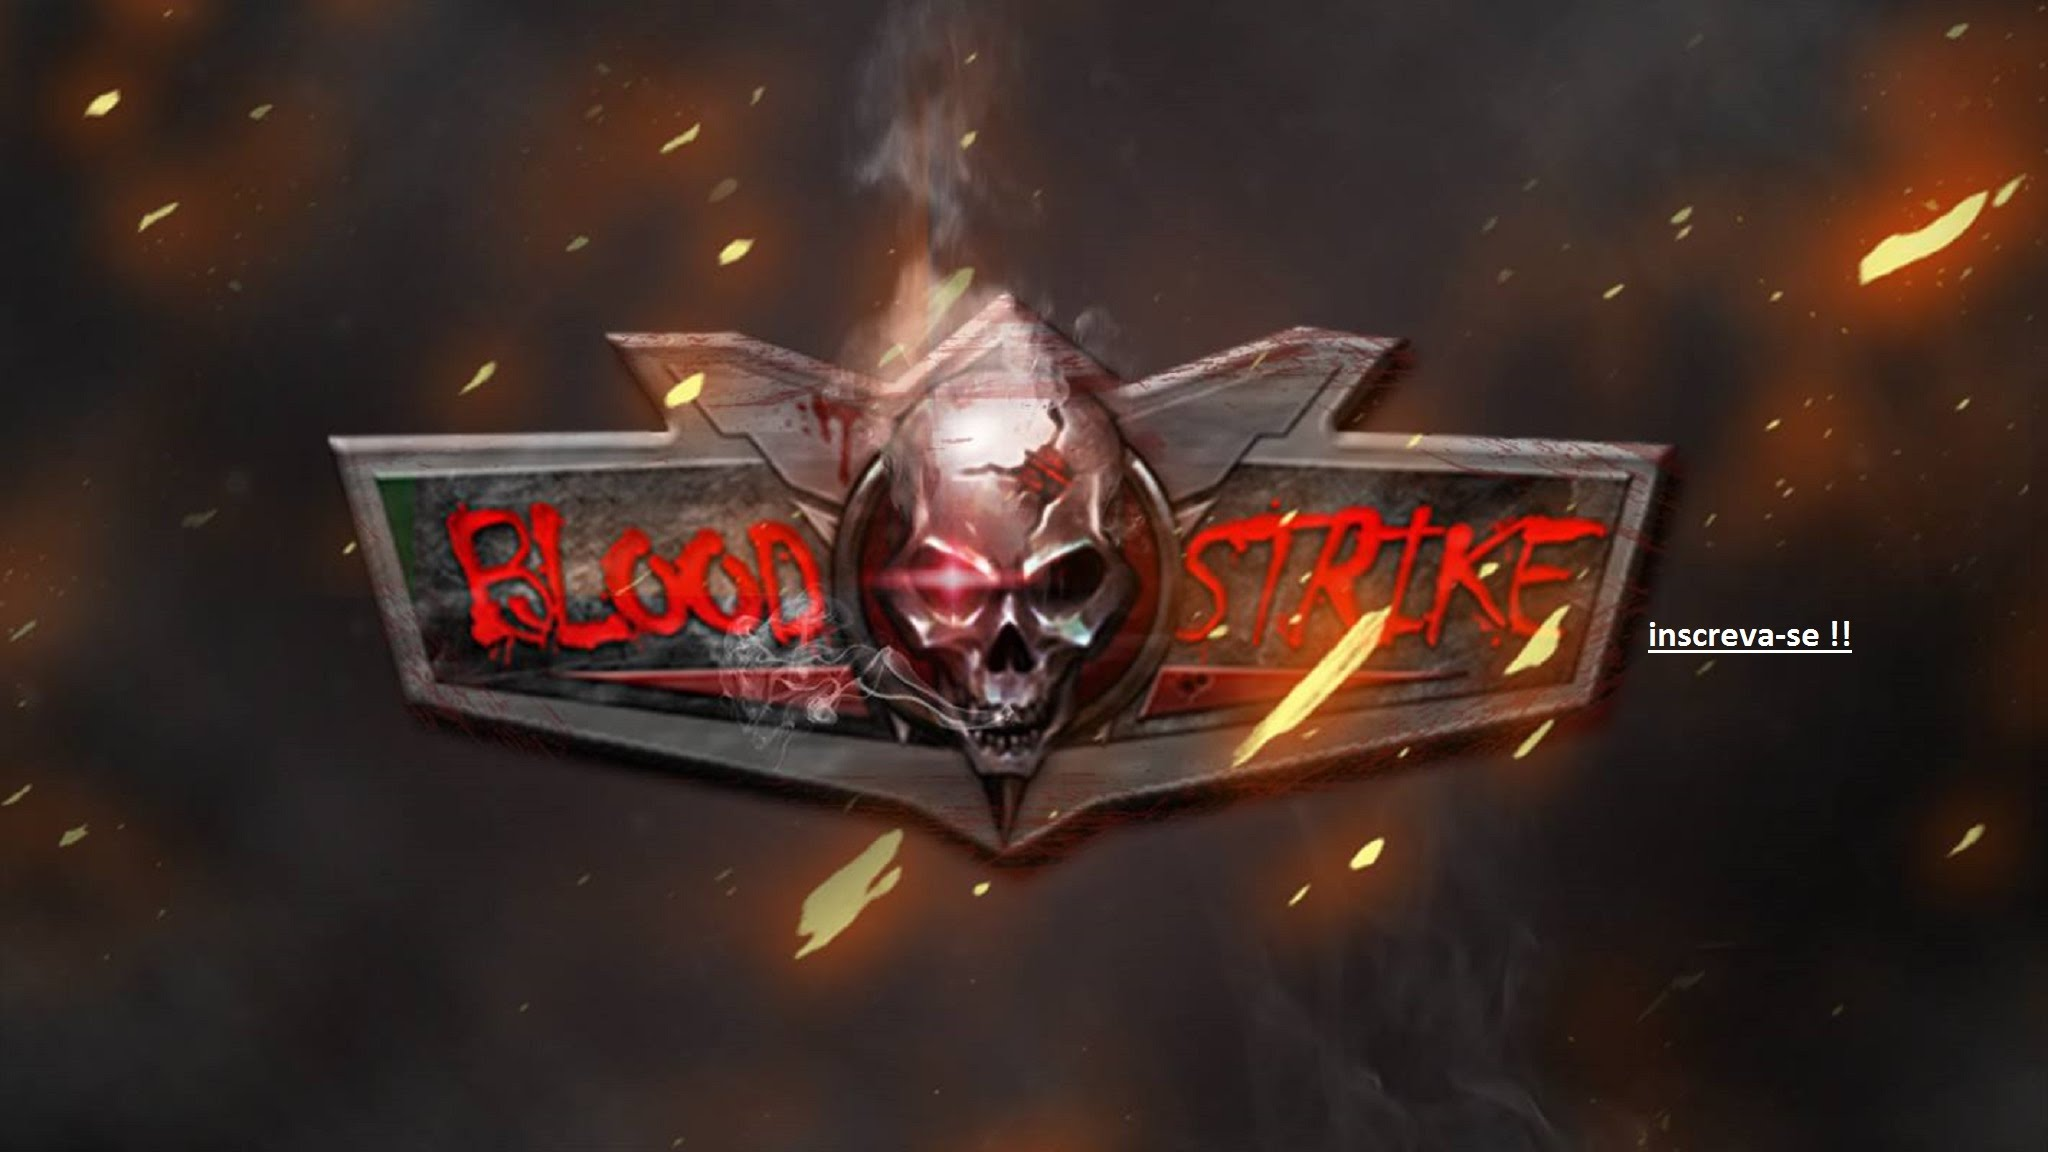 Bloodstrike Wallpapers Comics Hq Bloodstrike Pictures 4k